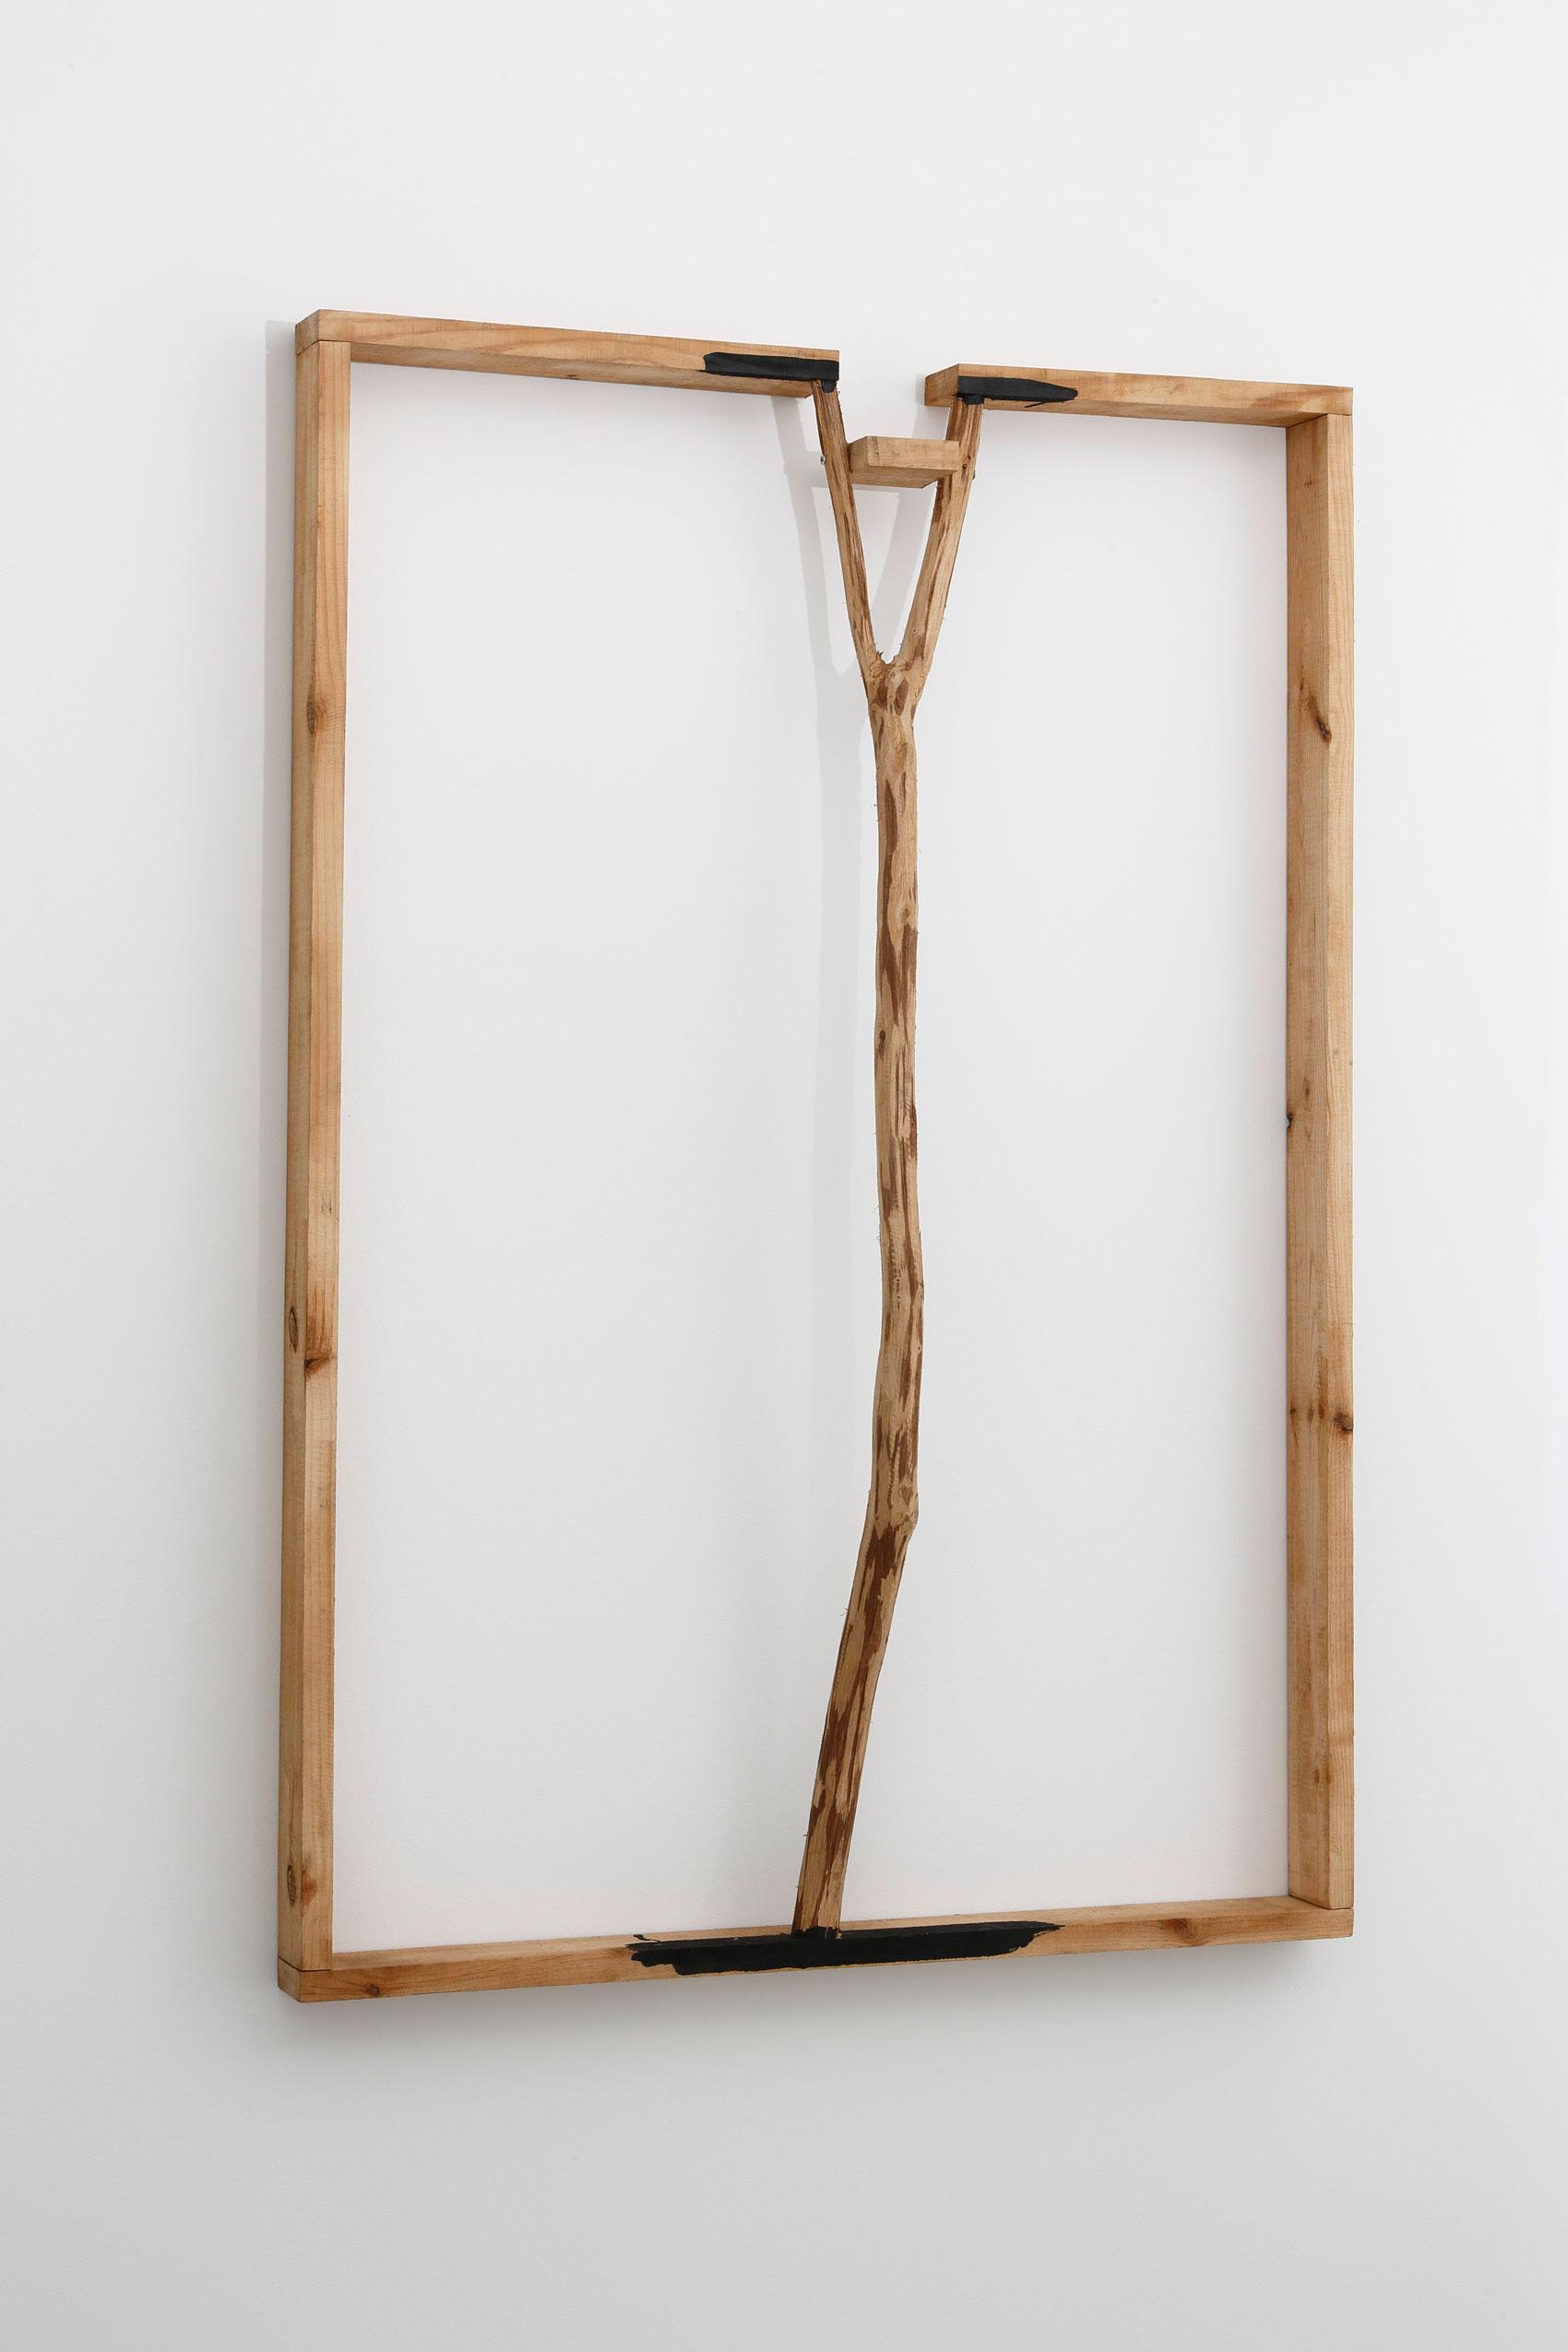 Surrounding Margin, Distanced Body , 1990 周縁距離体(3) [ Shūen Kyori-tai (3) ] Wood, paint 40 7/16 x 25 3/8 x 1 3/4 inches 102.7 x 64.5 x 4.4 centimeters